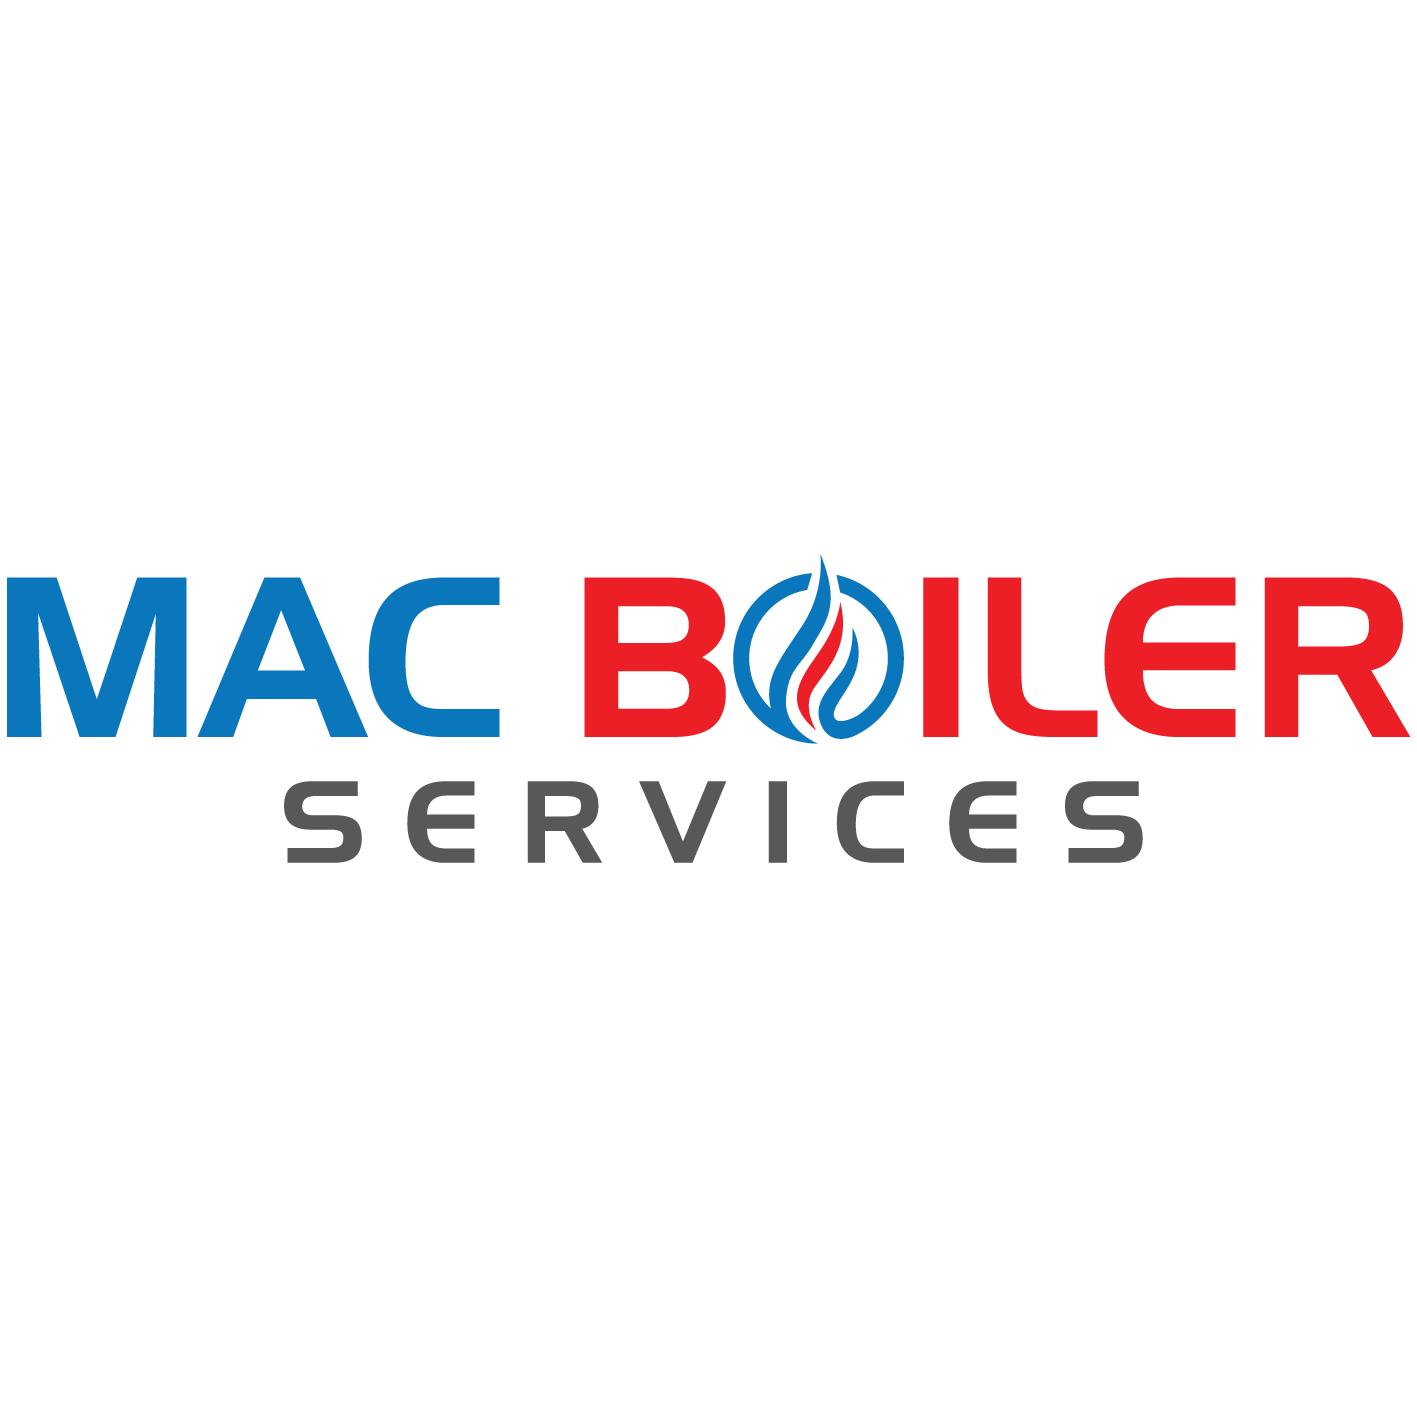 MAC Boiler Services image